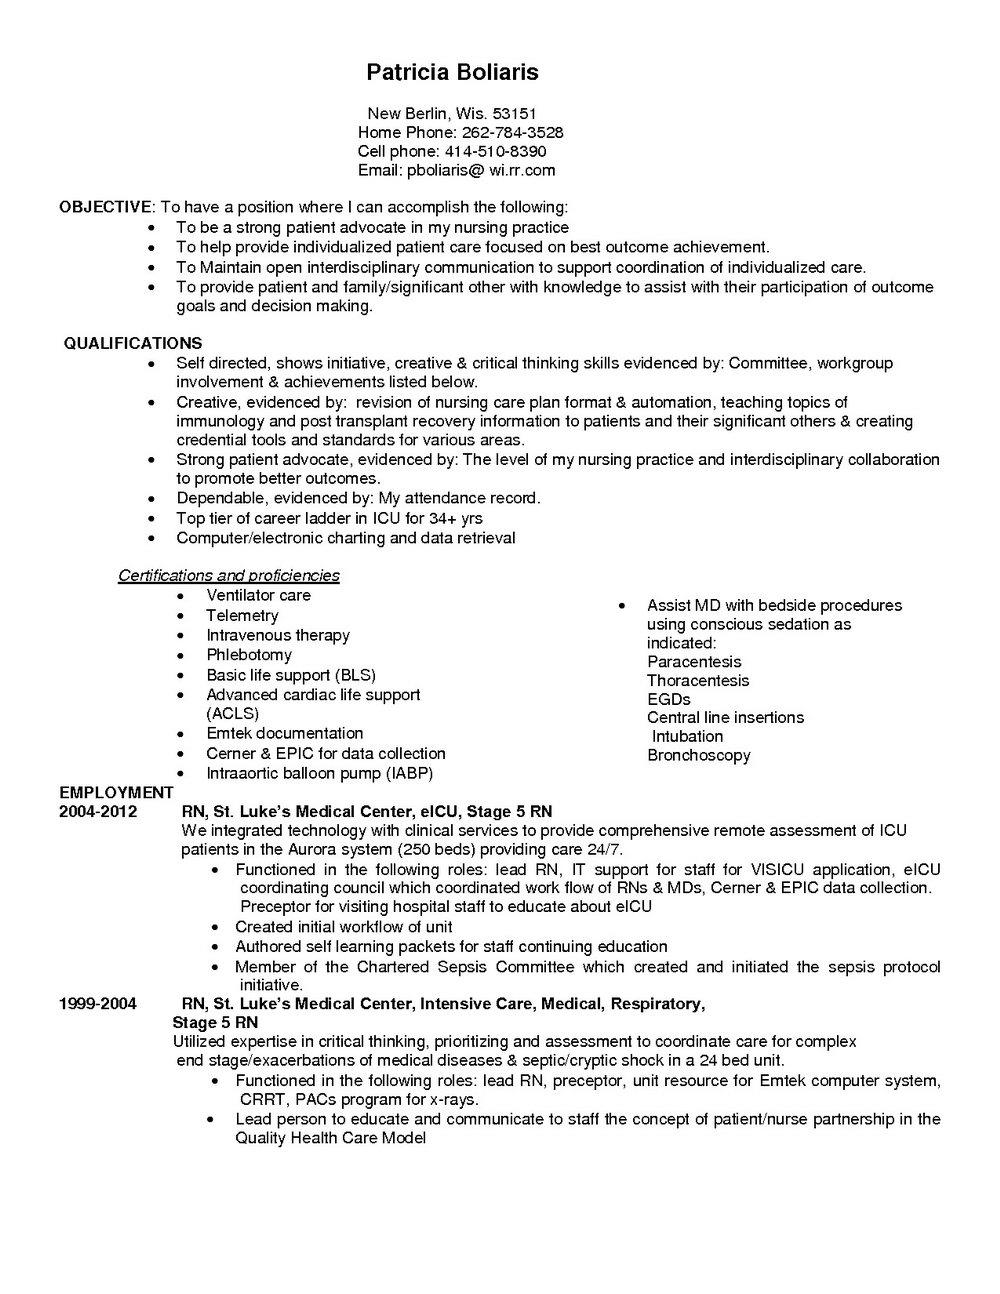 Sample Resume For Icu Rn